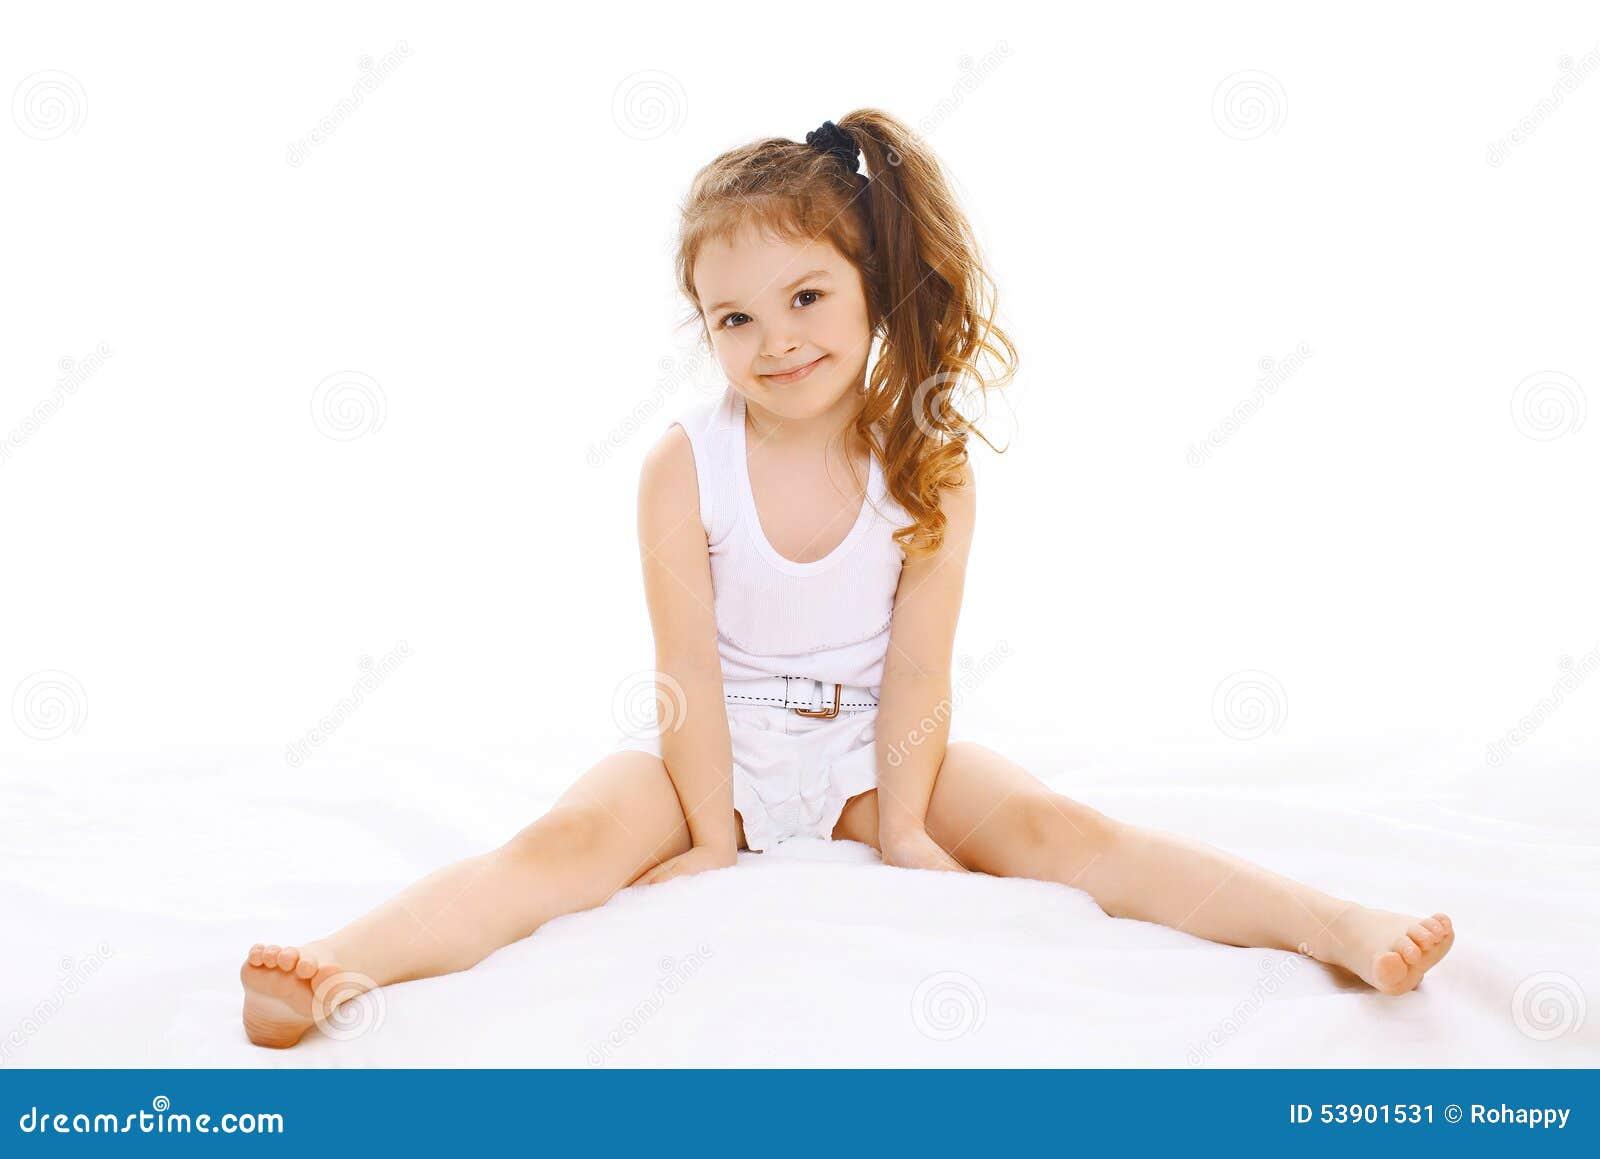 Portrait Of Happy Little Girl Child Stock Photo Image 53901531